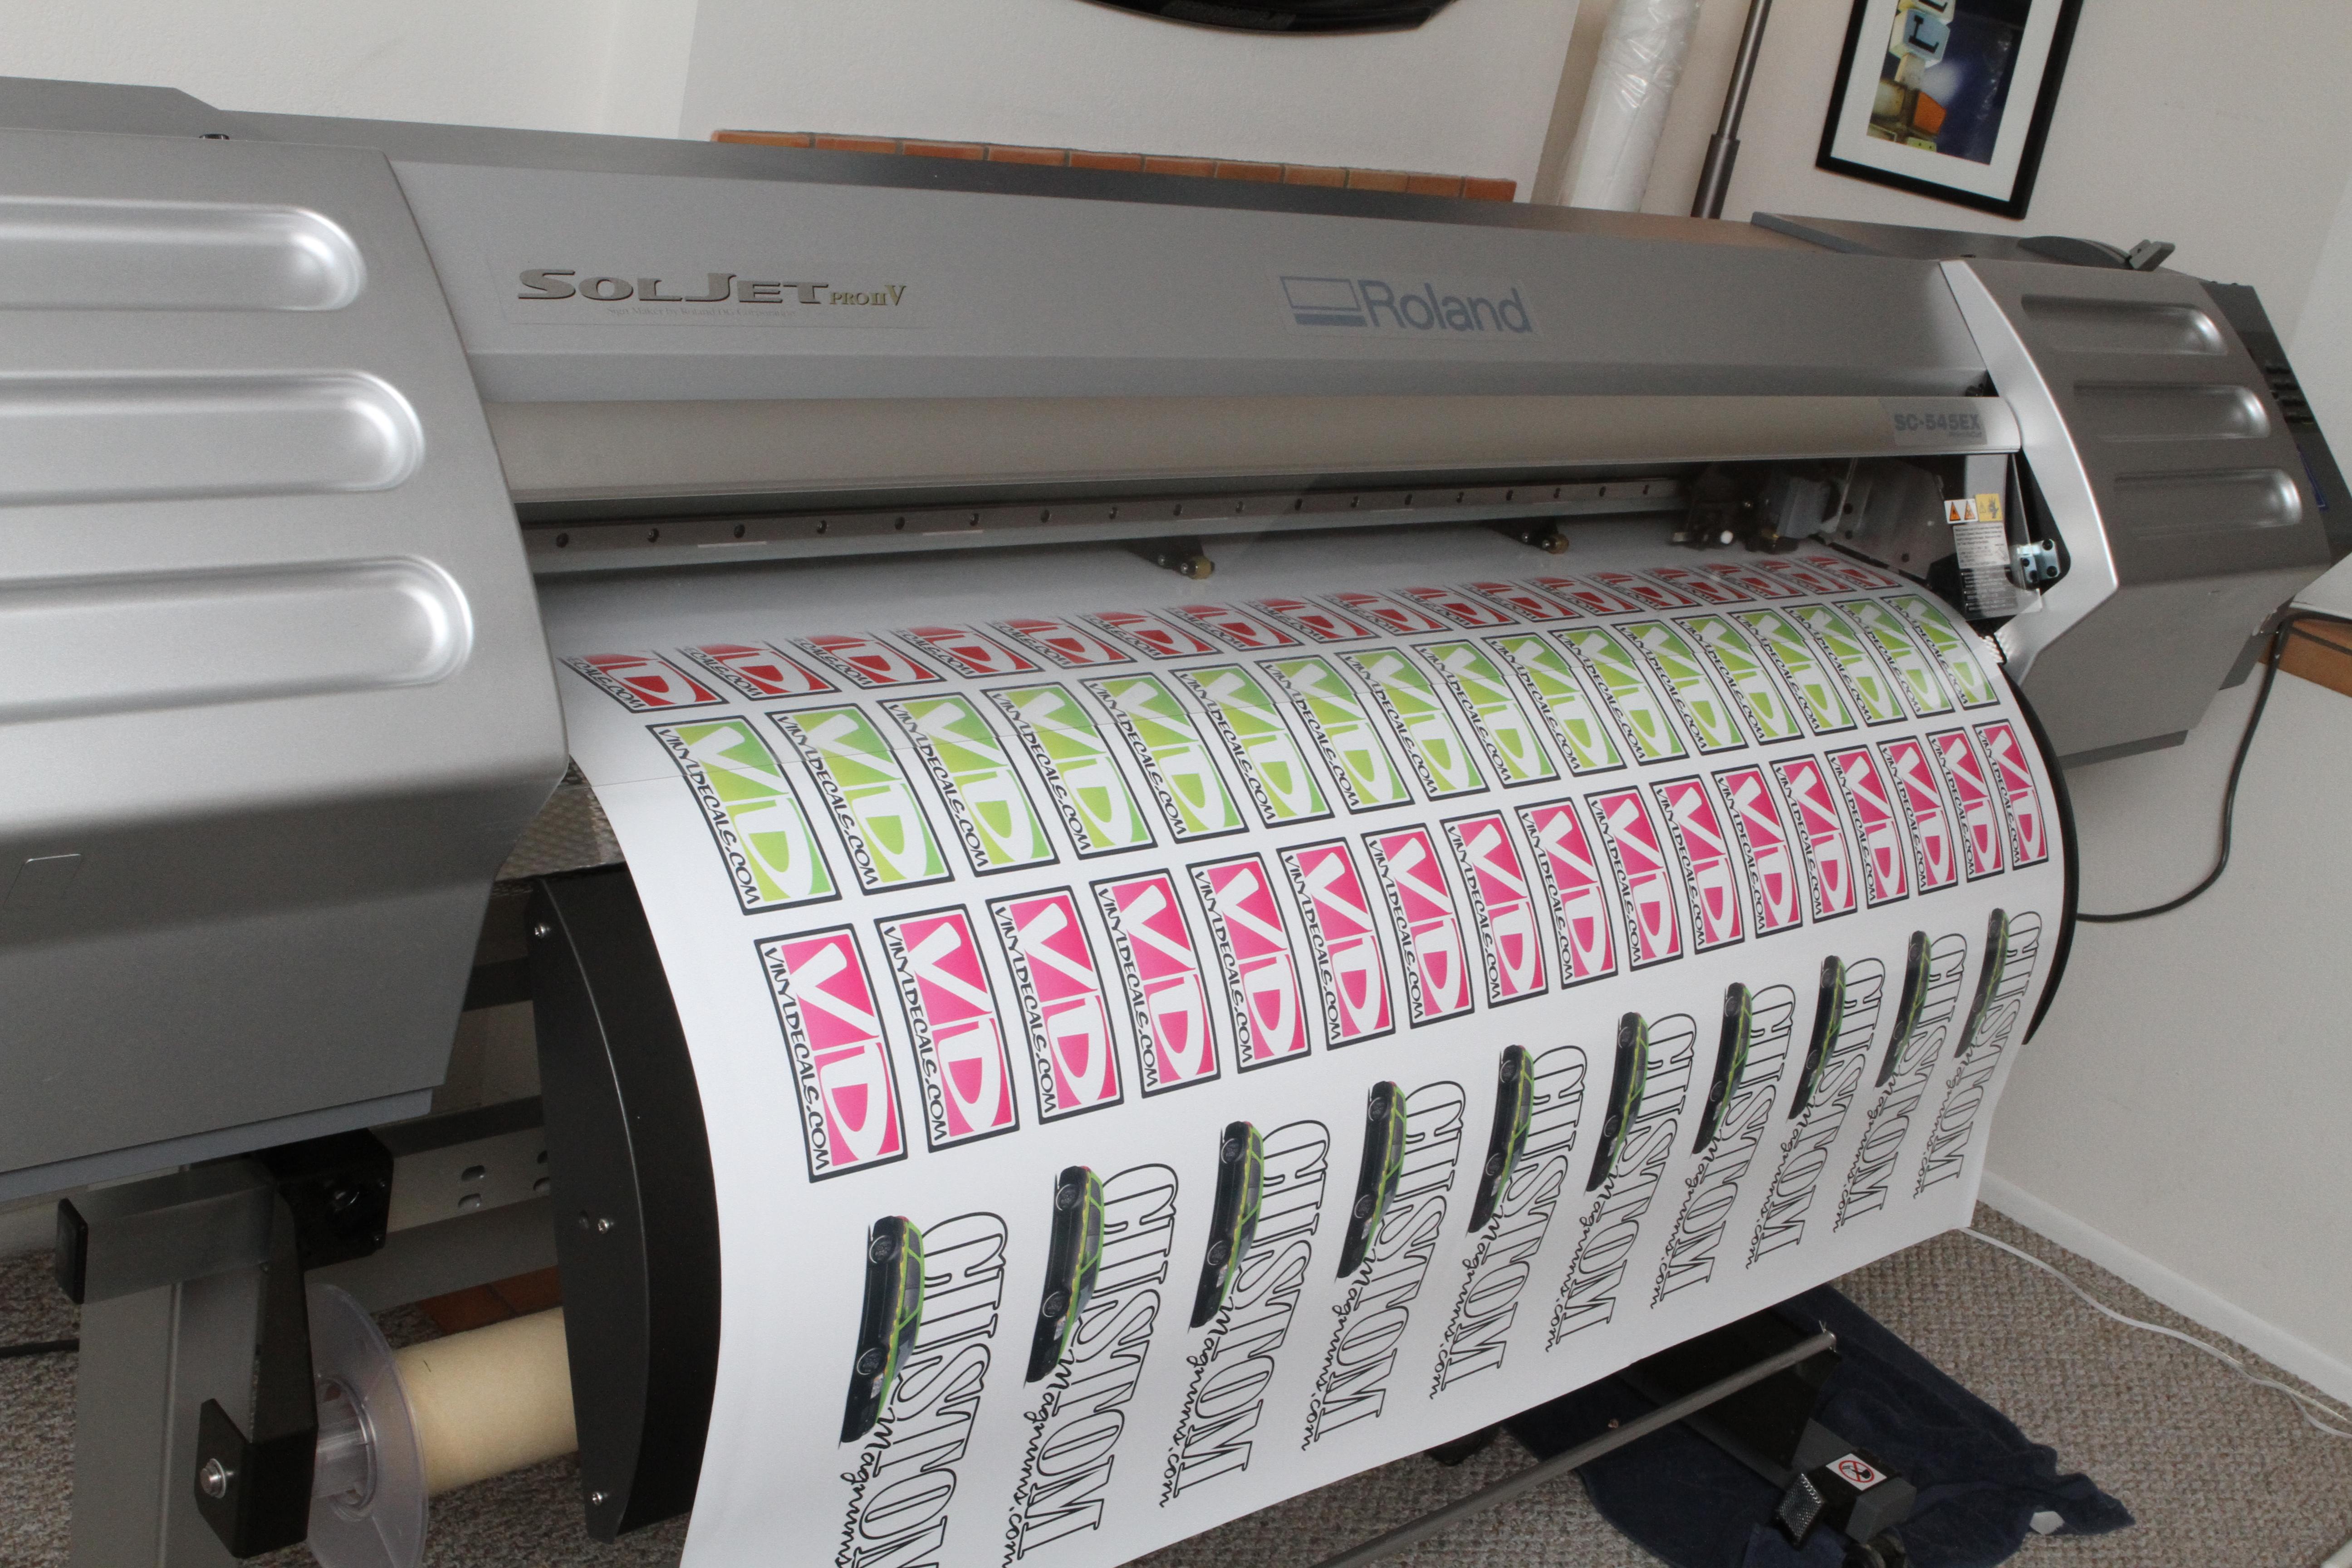 Roland Sc Vinyl Decals Graphics And Stickers - Vinyl decal printer